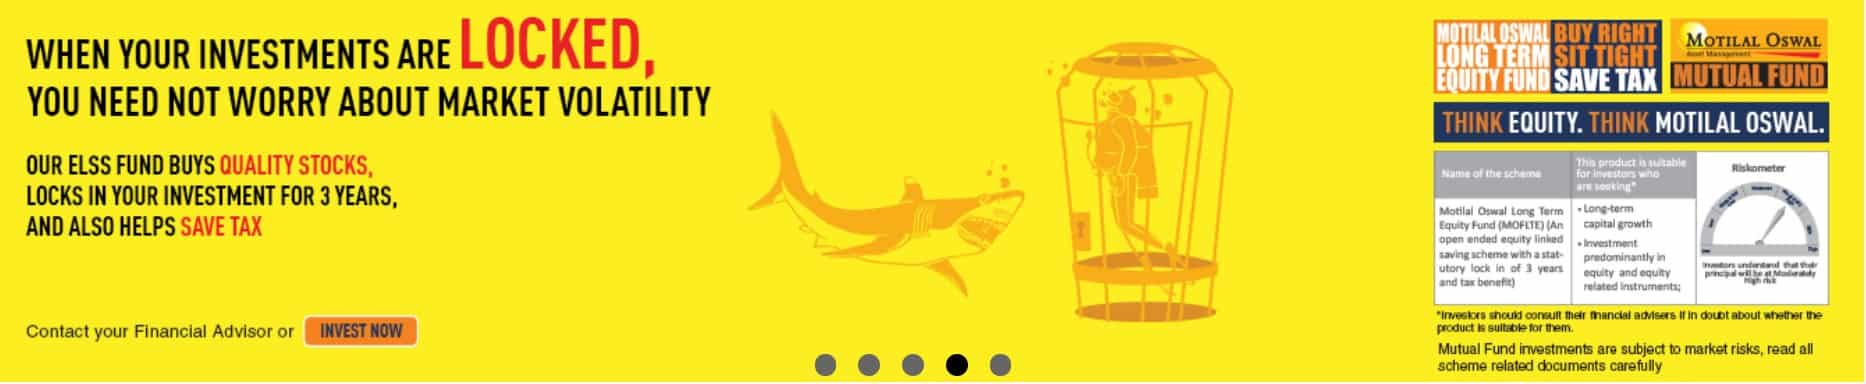 Captura de pantalla del anuncio del Fondo Motilal Oswal ELSS de su sitio web